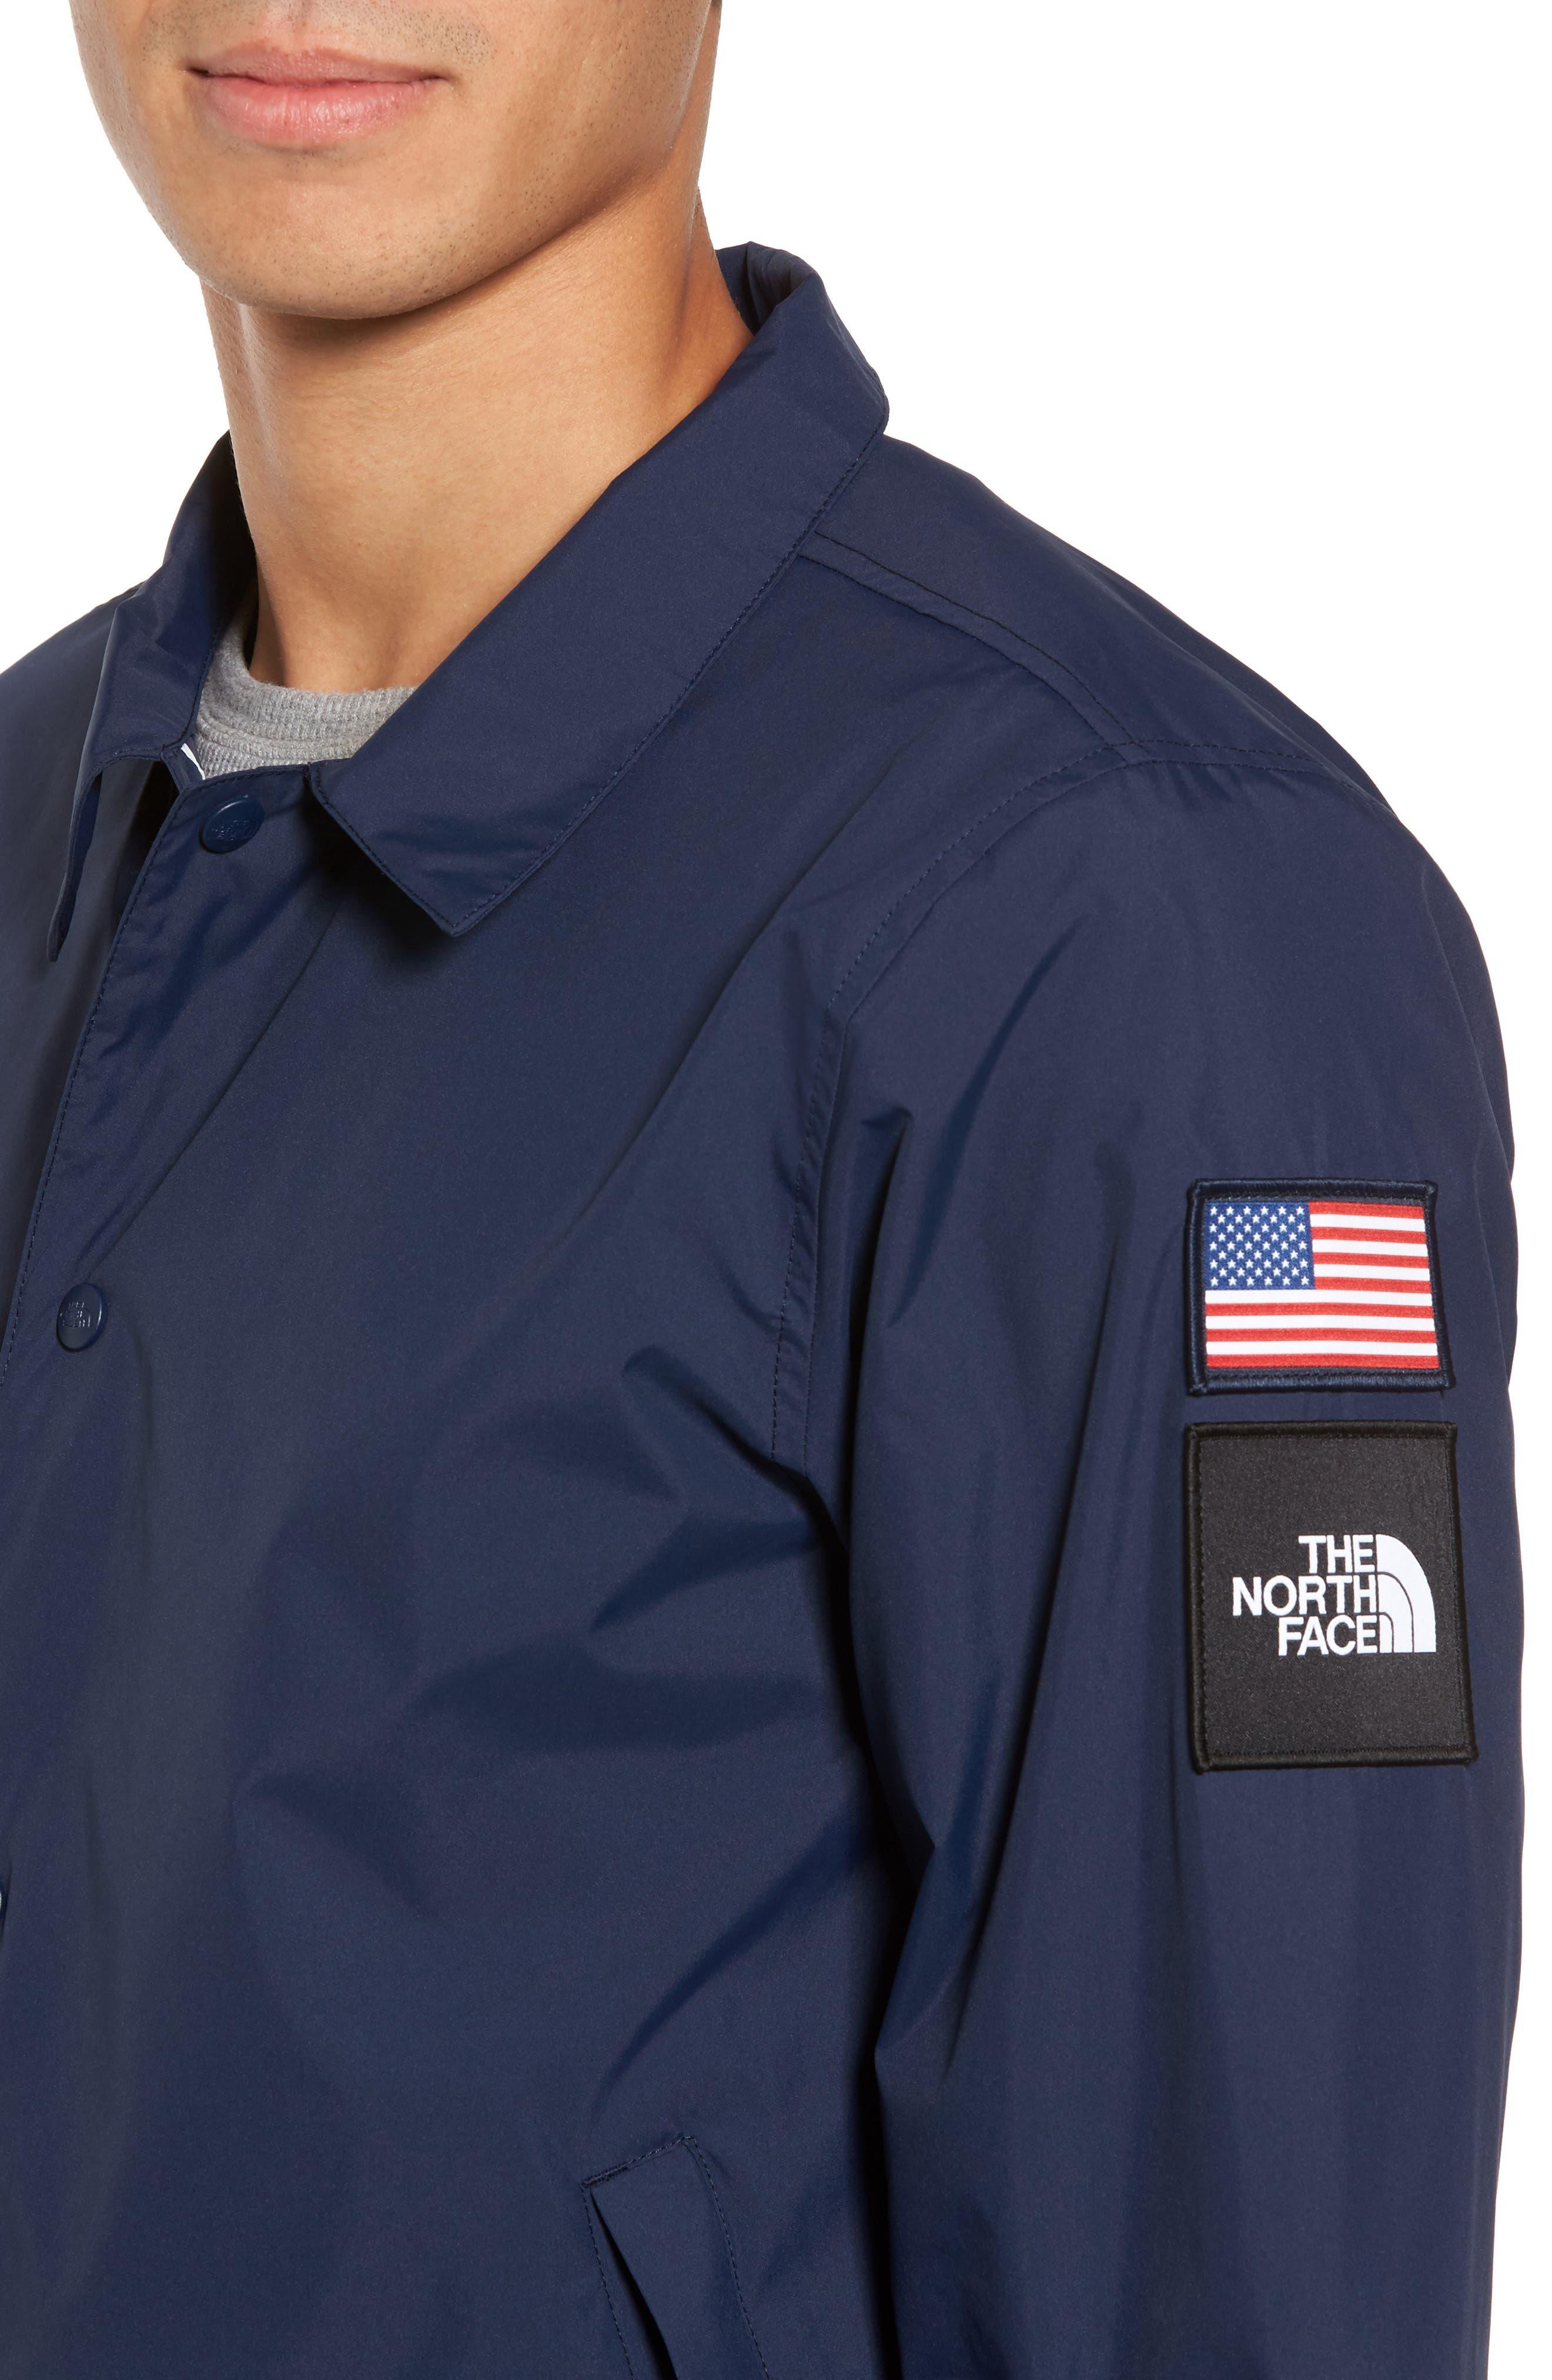 International Collection Coach Jacket,                             Alternate thumbnail 12, color,